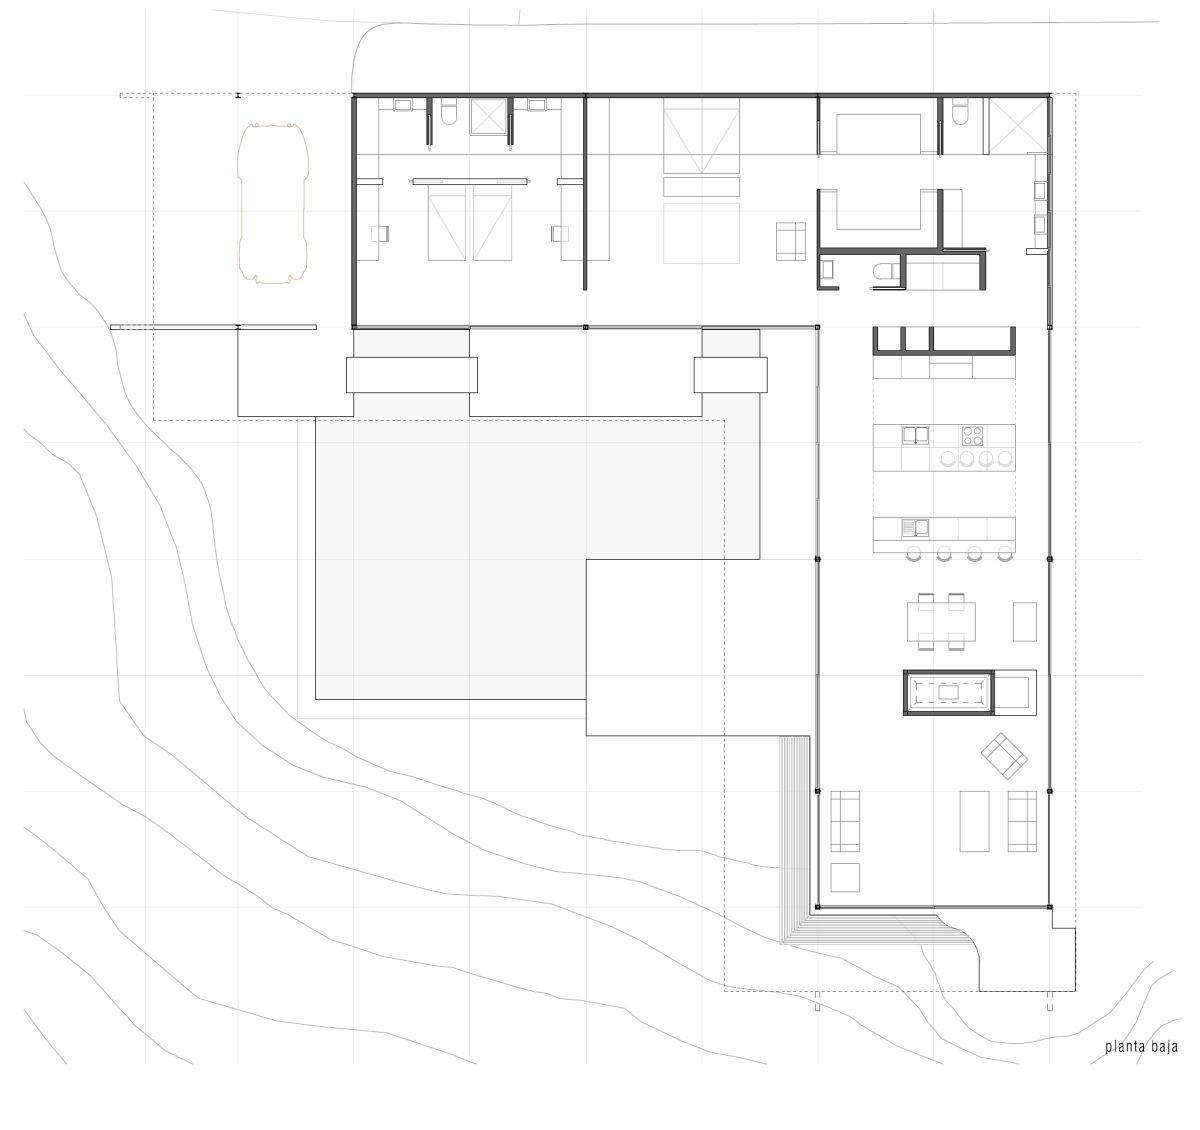 csh22 01a case 22 pinterest stahl house case study design and rh pinterest com Case Study House 21 Pierre Koenig Drawings